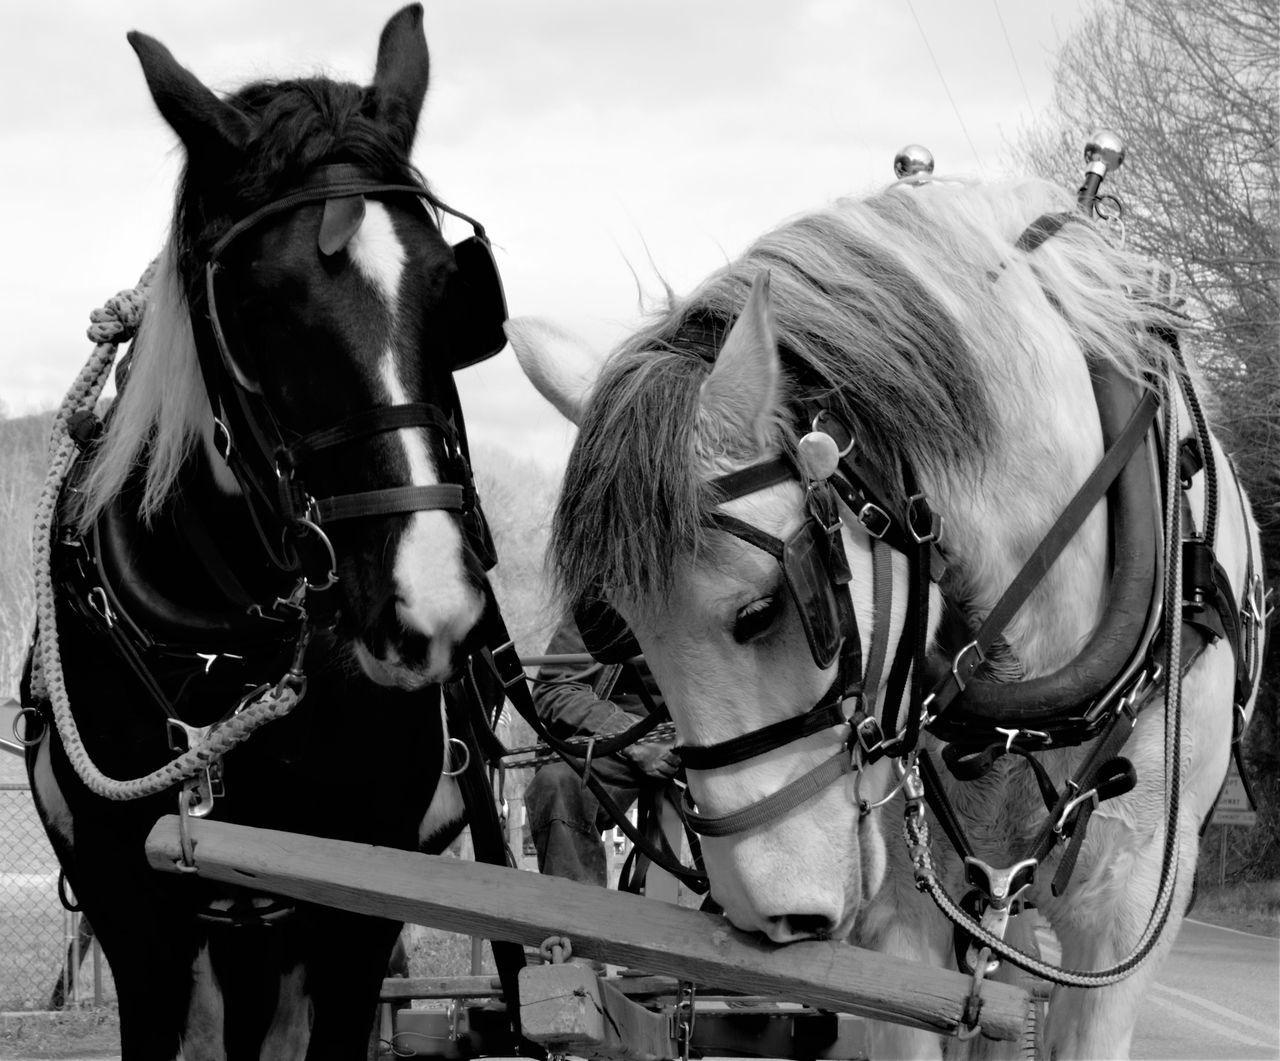 Black And White Blackandwhite Domestic Animals Horse Horse Photography  Horses Working Animal